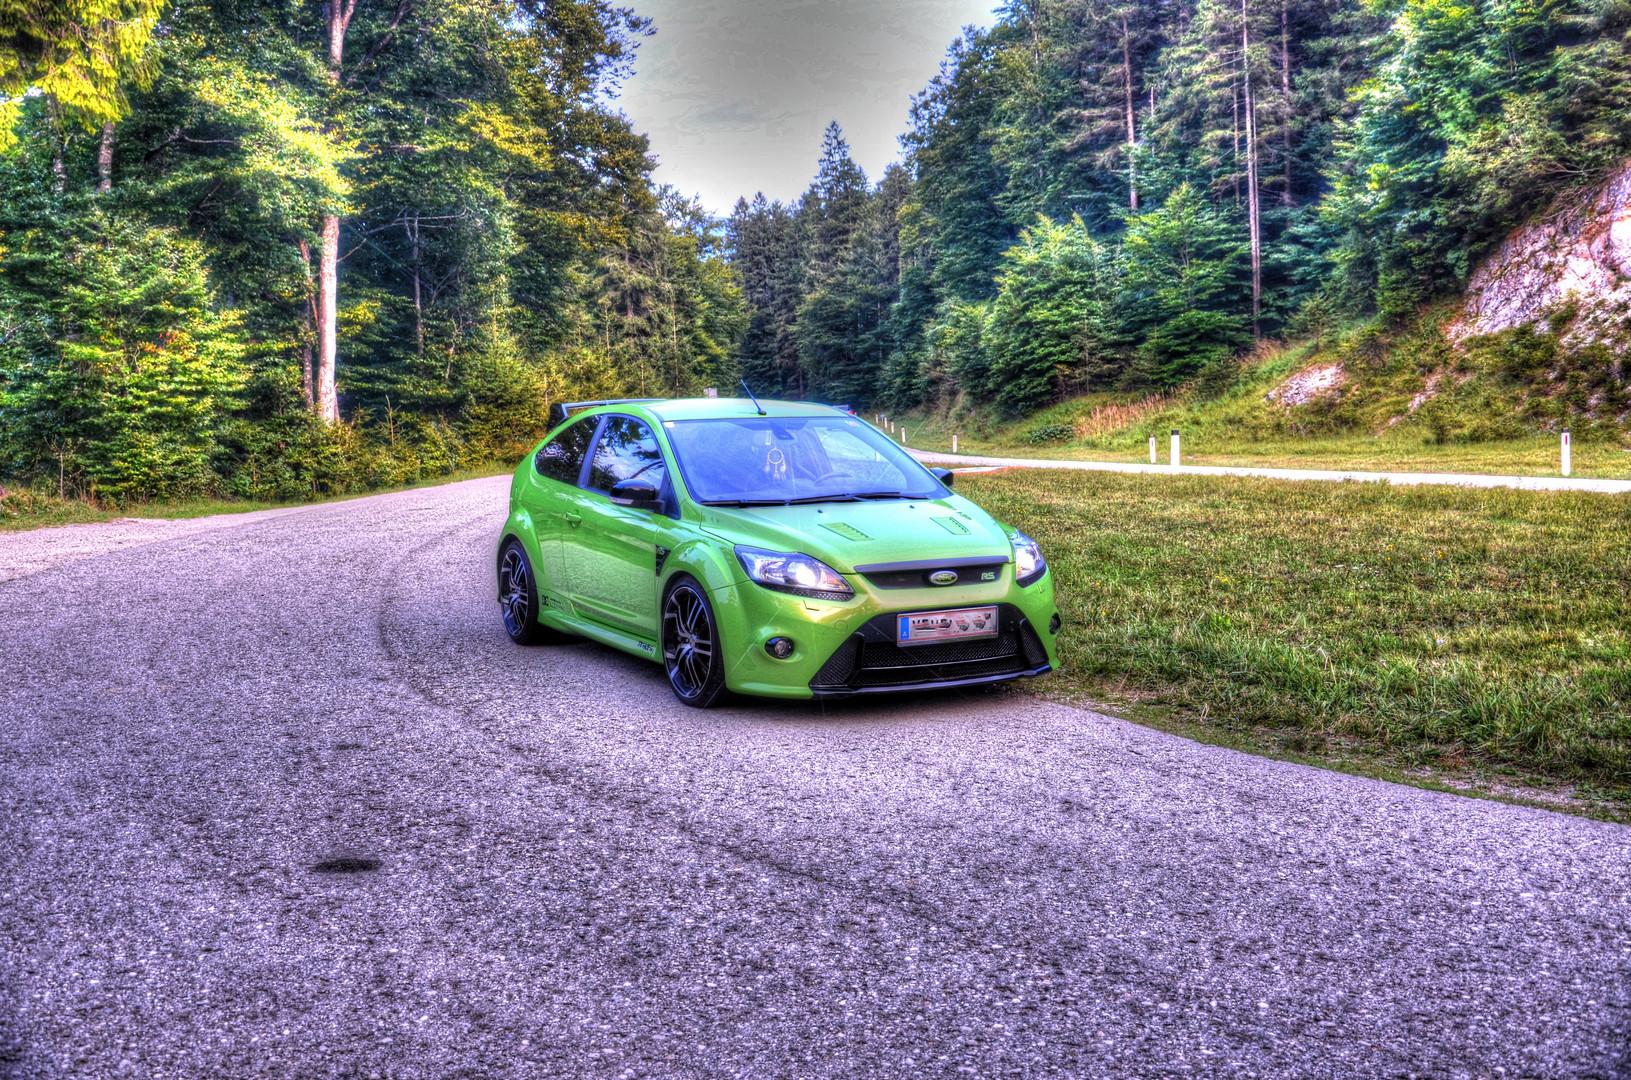 Mein Focus RS